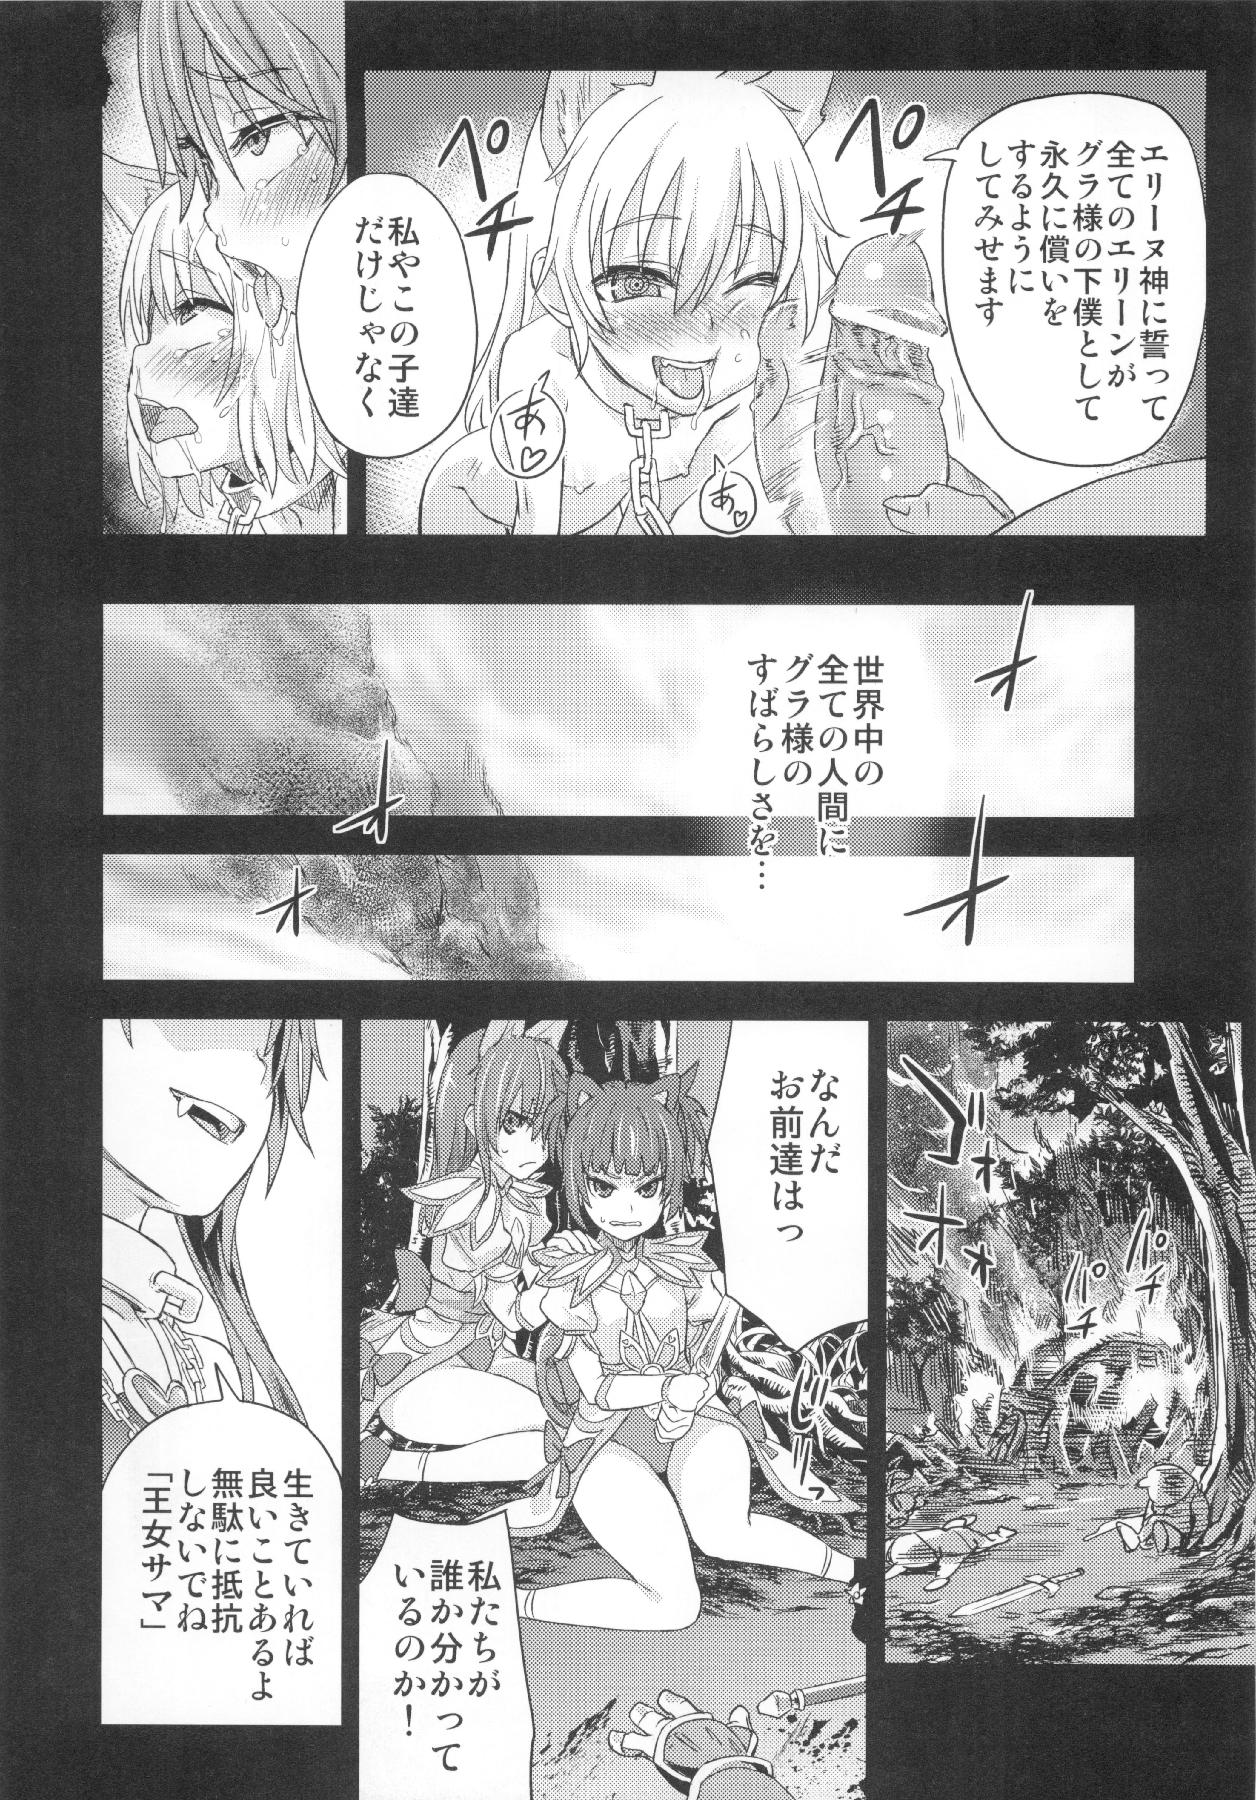 (C83) [Fatalpulse (Asanagi)] VictimGirls Compiled Vol.1 -Victimgirls Soushuuhen 1- MMO Game Selection (Various) 178